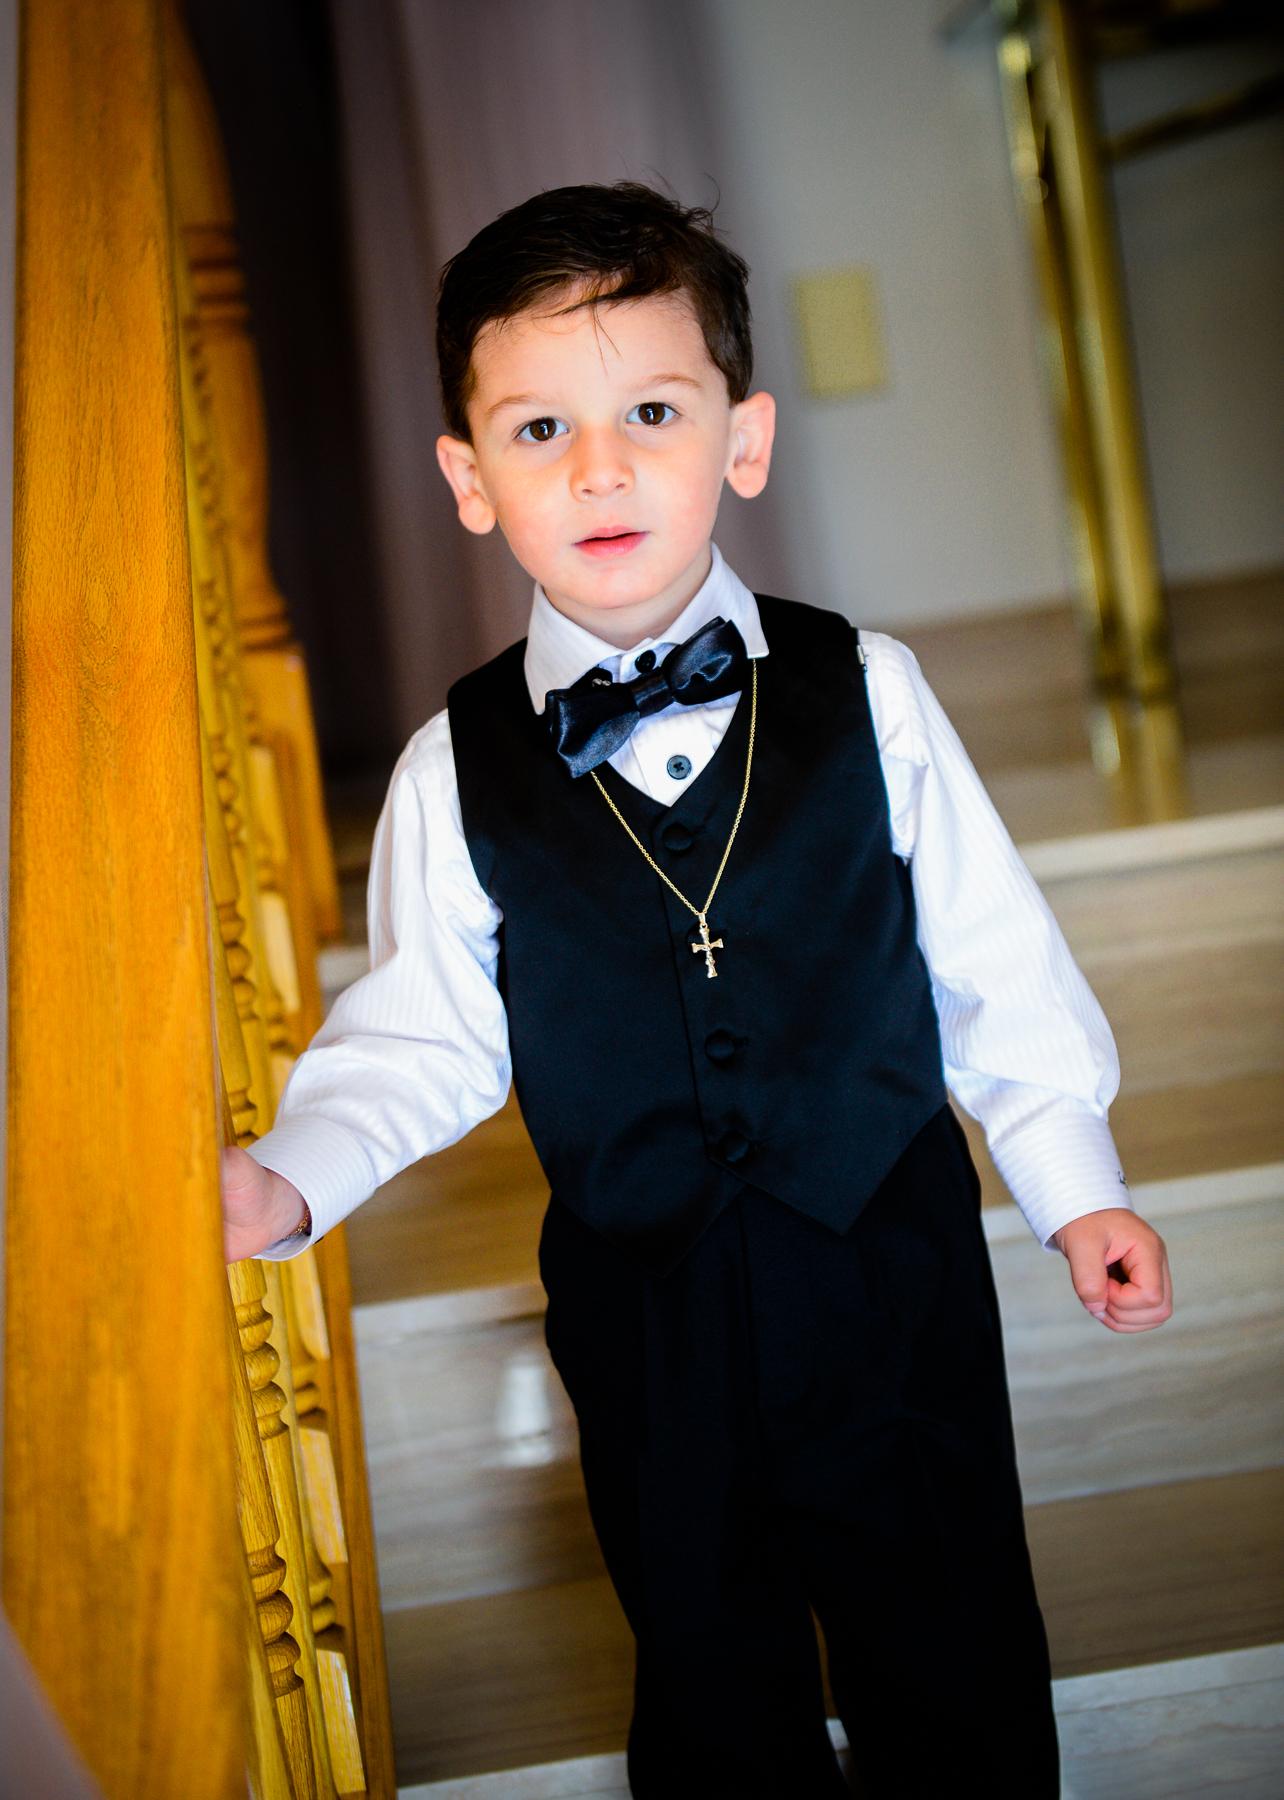 Boston Wedding Photographer Christian Pleva-18.jpg